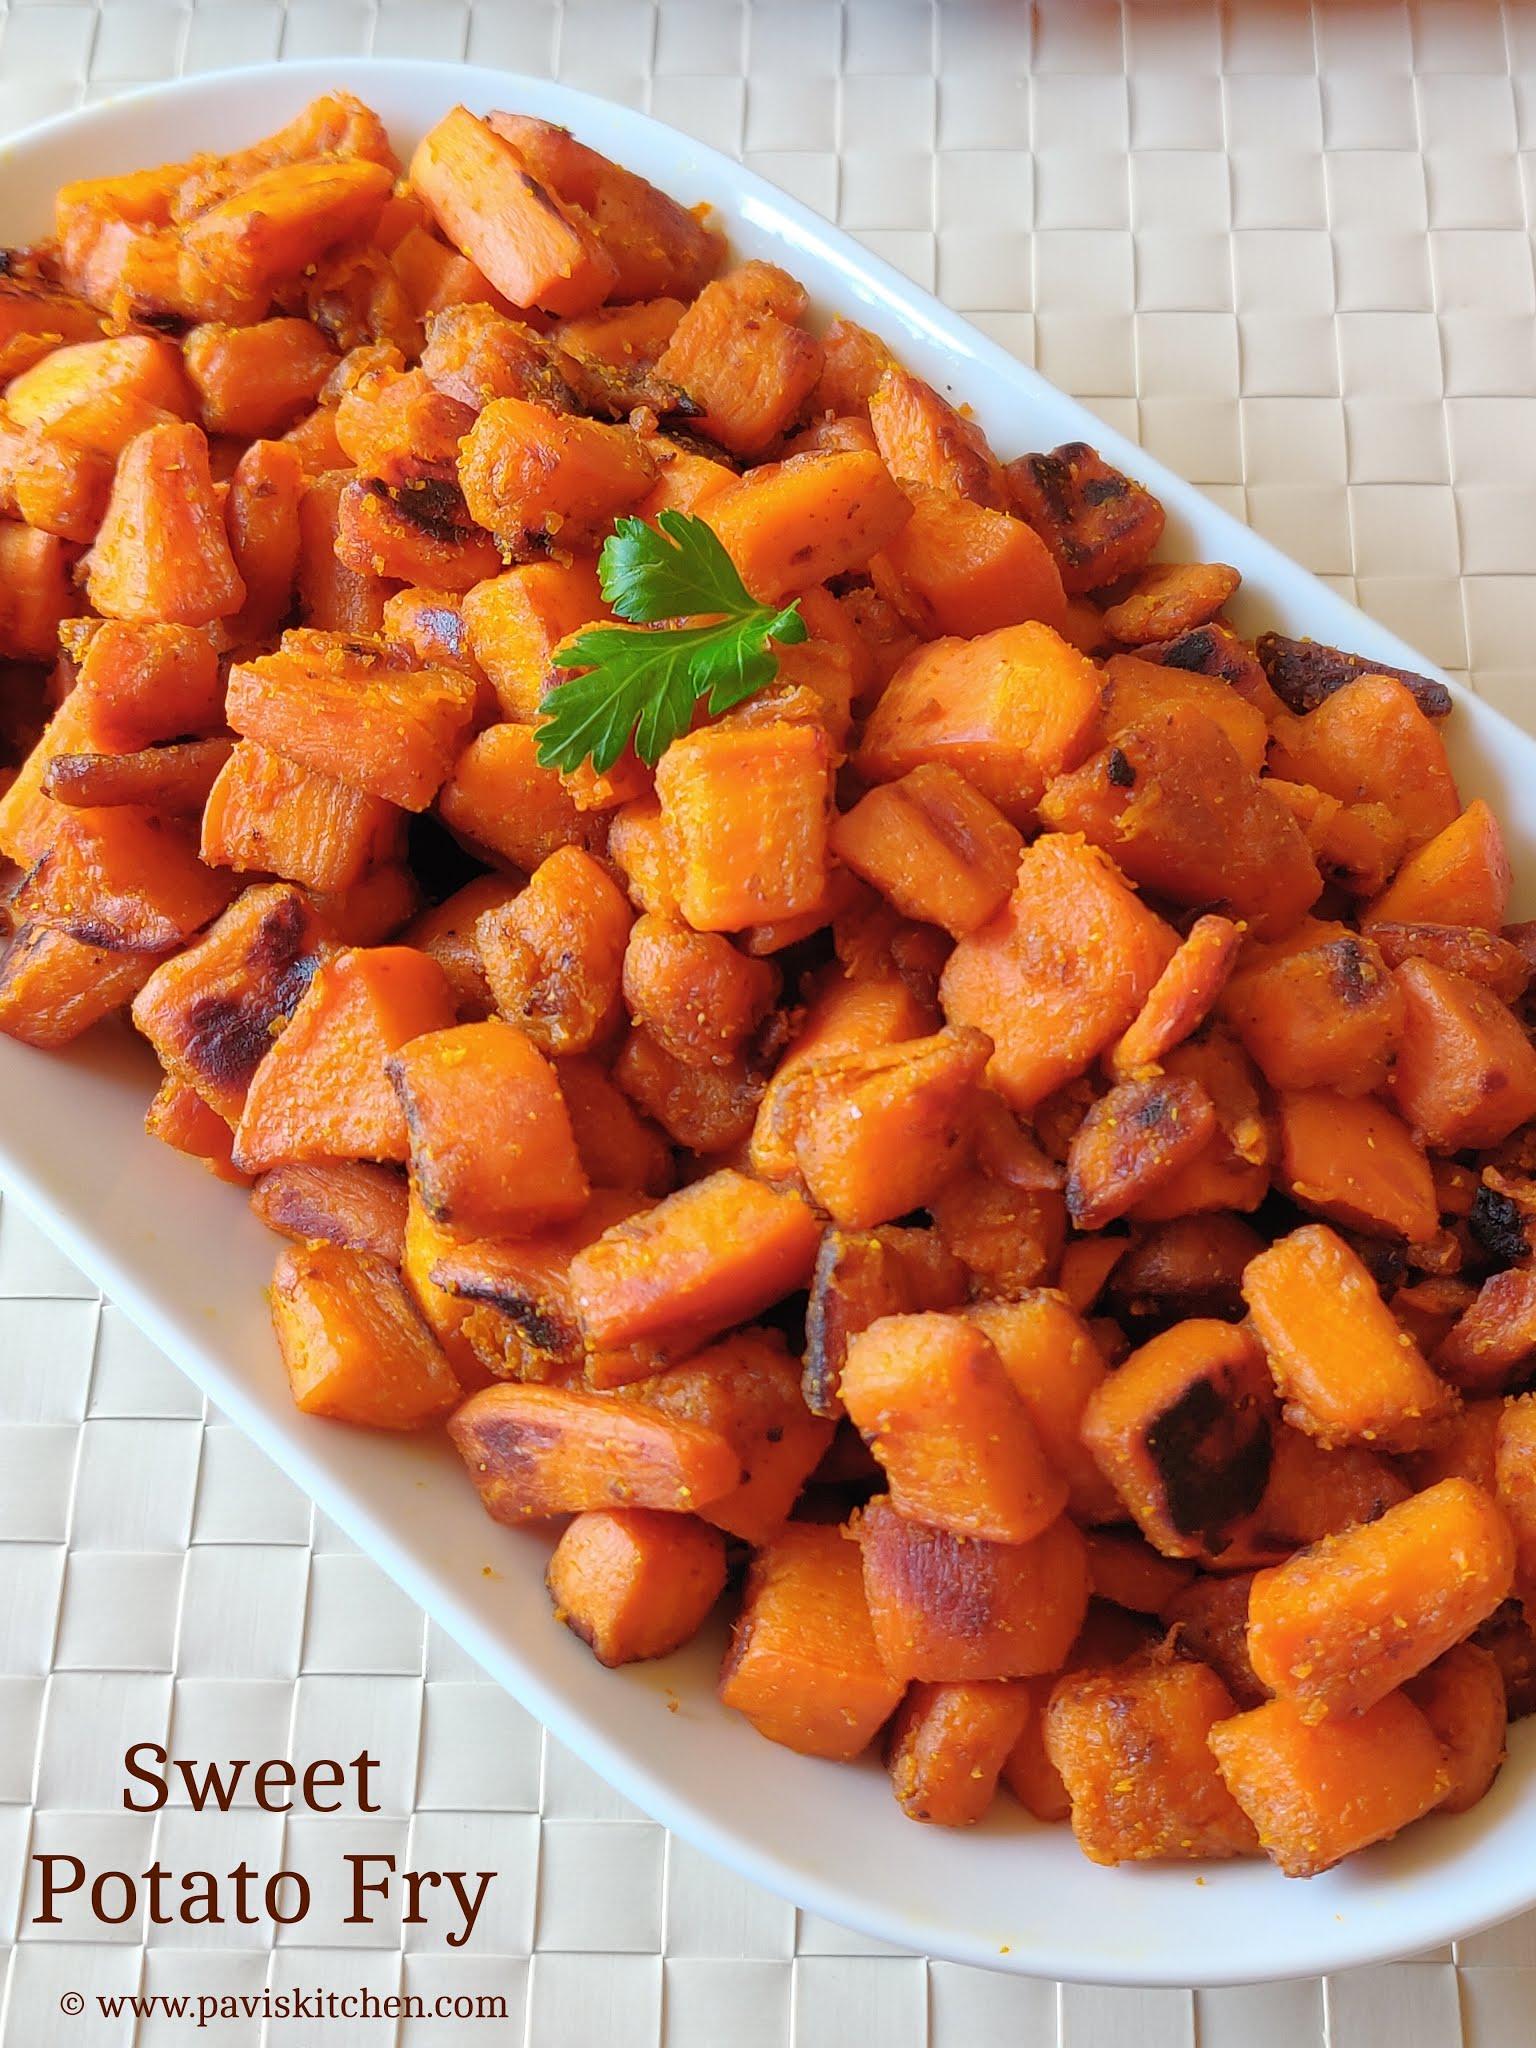 Sweet potato fry Indian | Sweet potato curry | Sakkaravalli kizhangu varuval / Poriyal recipe